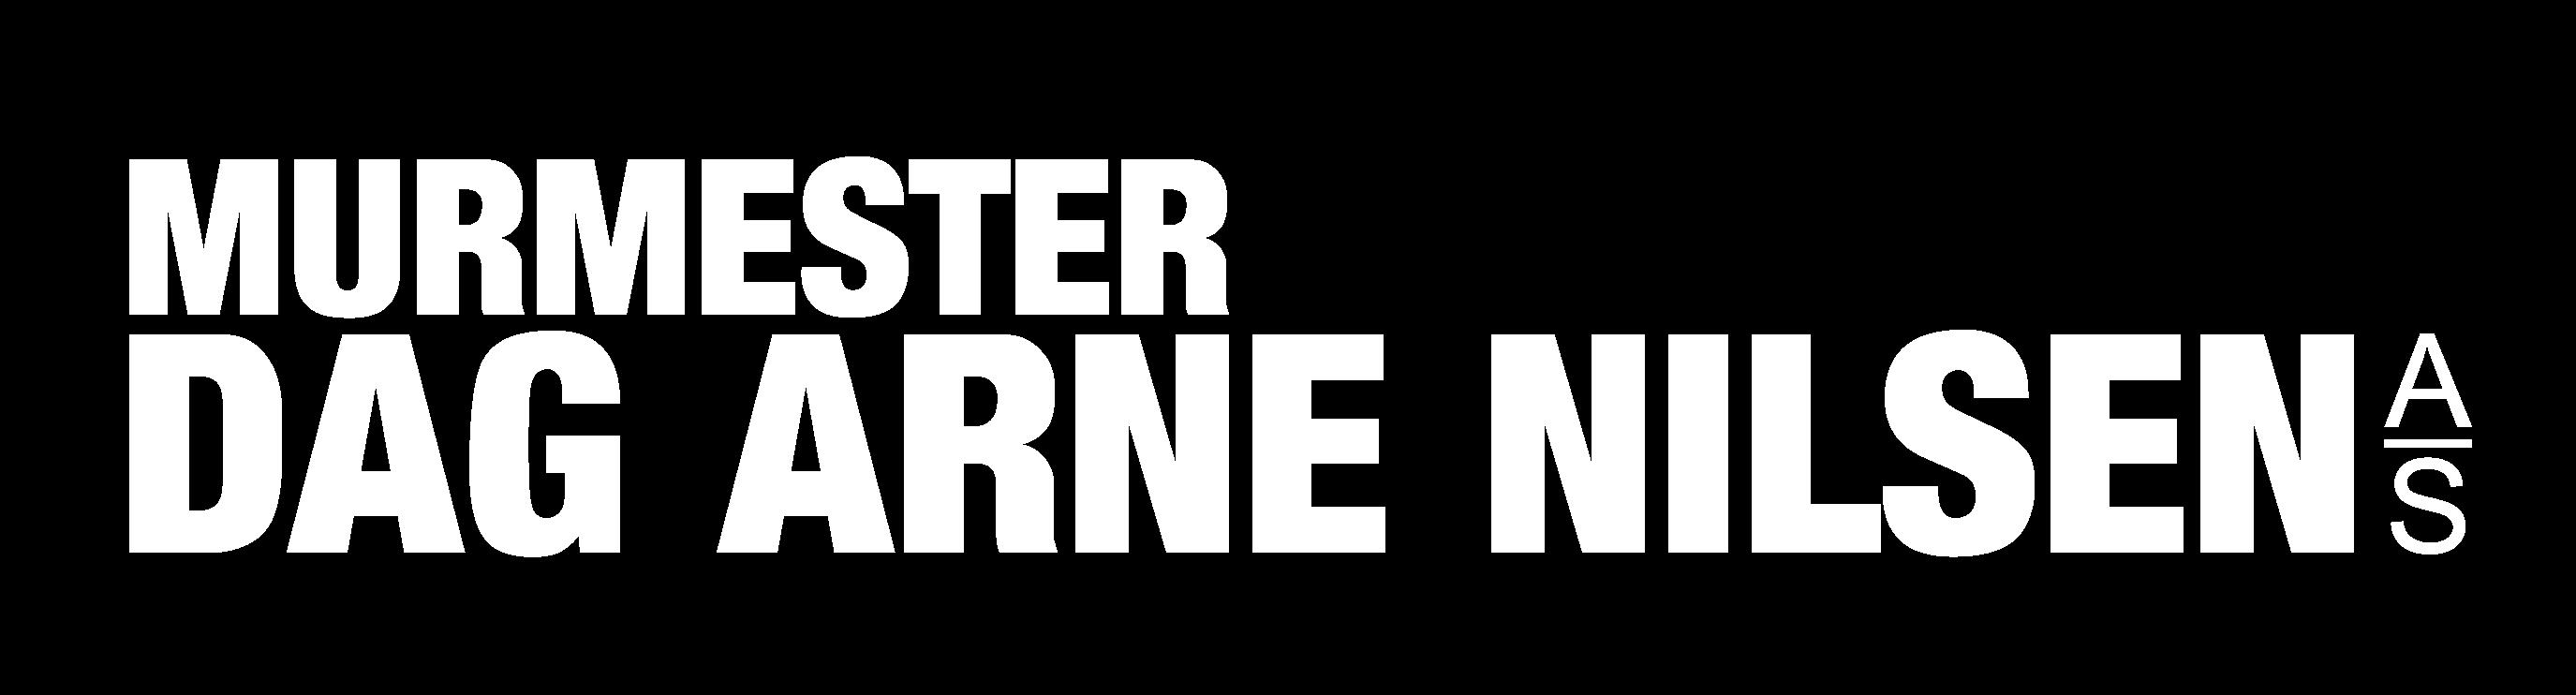 Dag Arne Nilsen